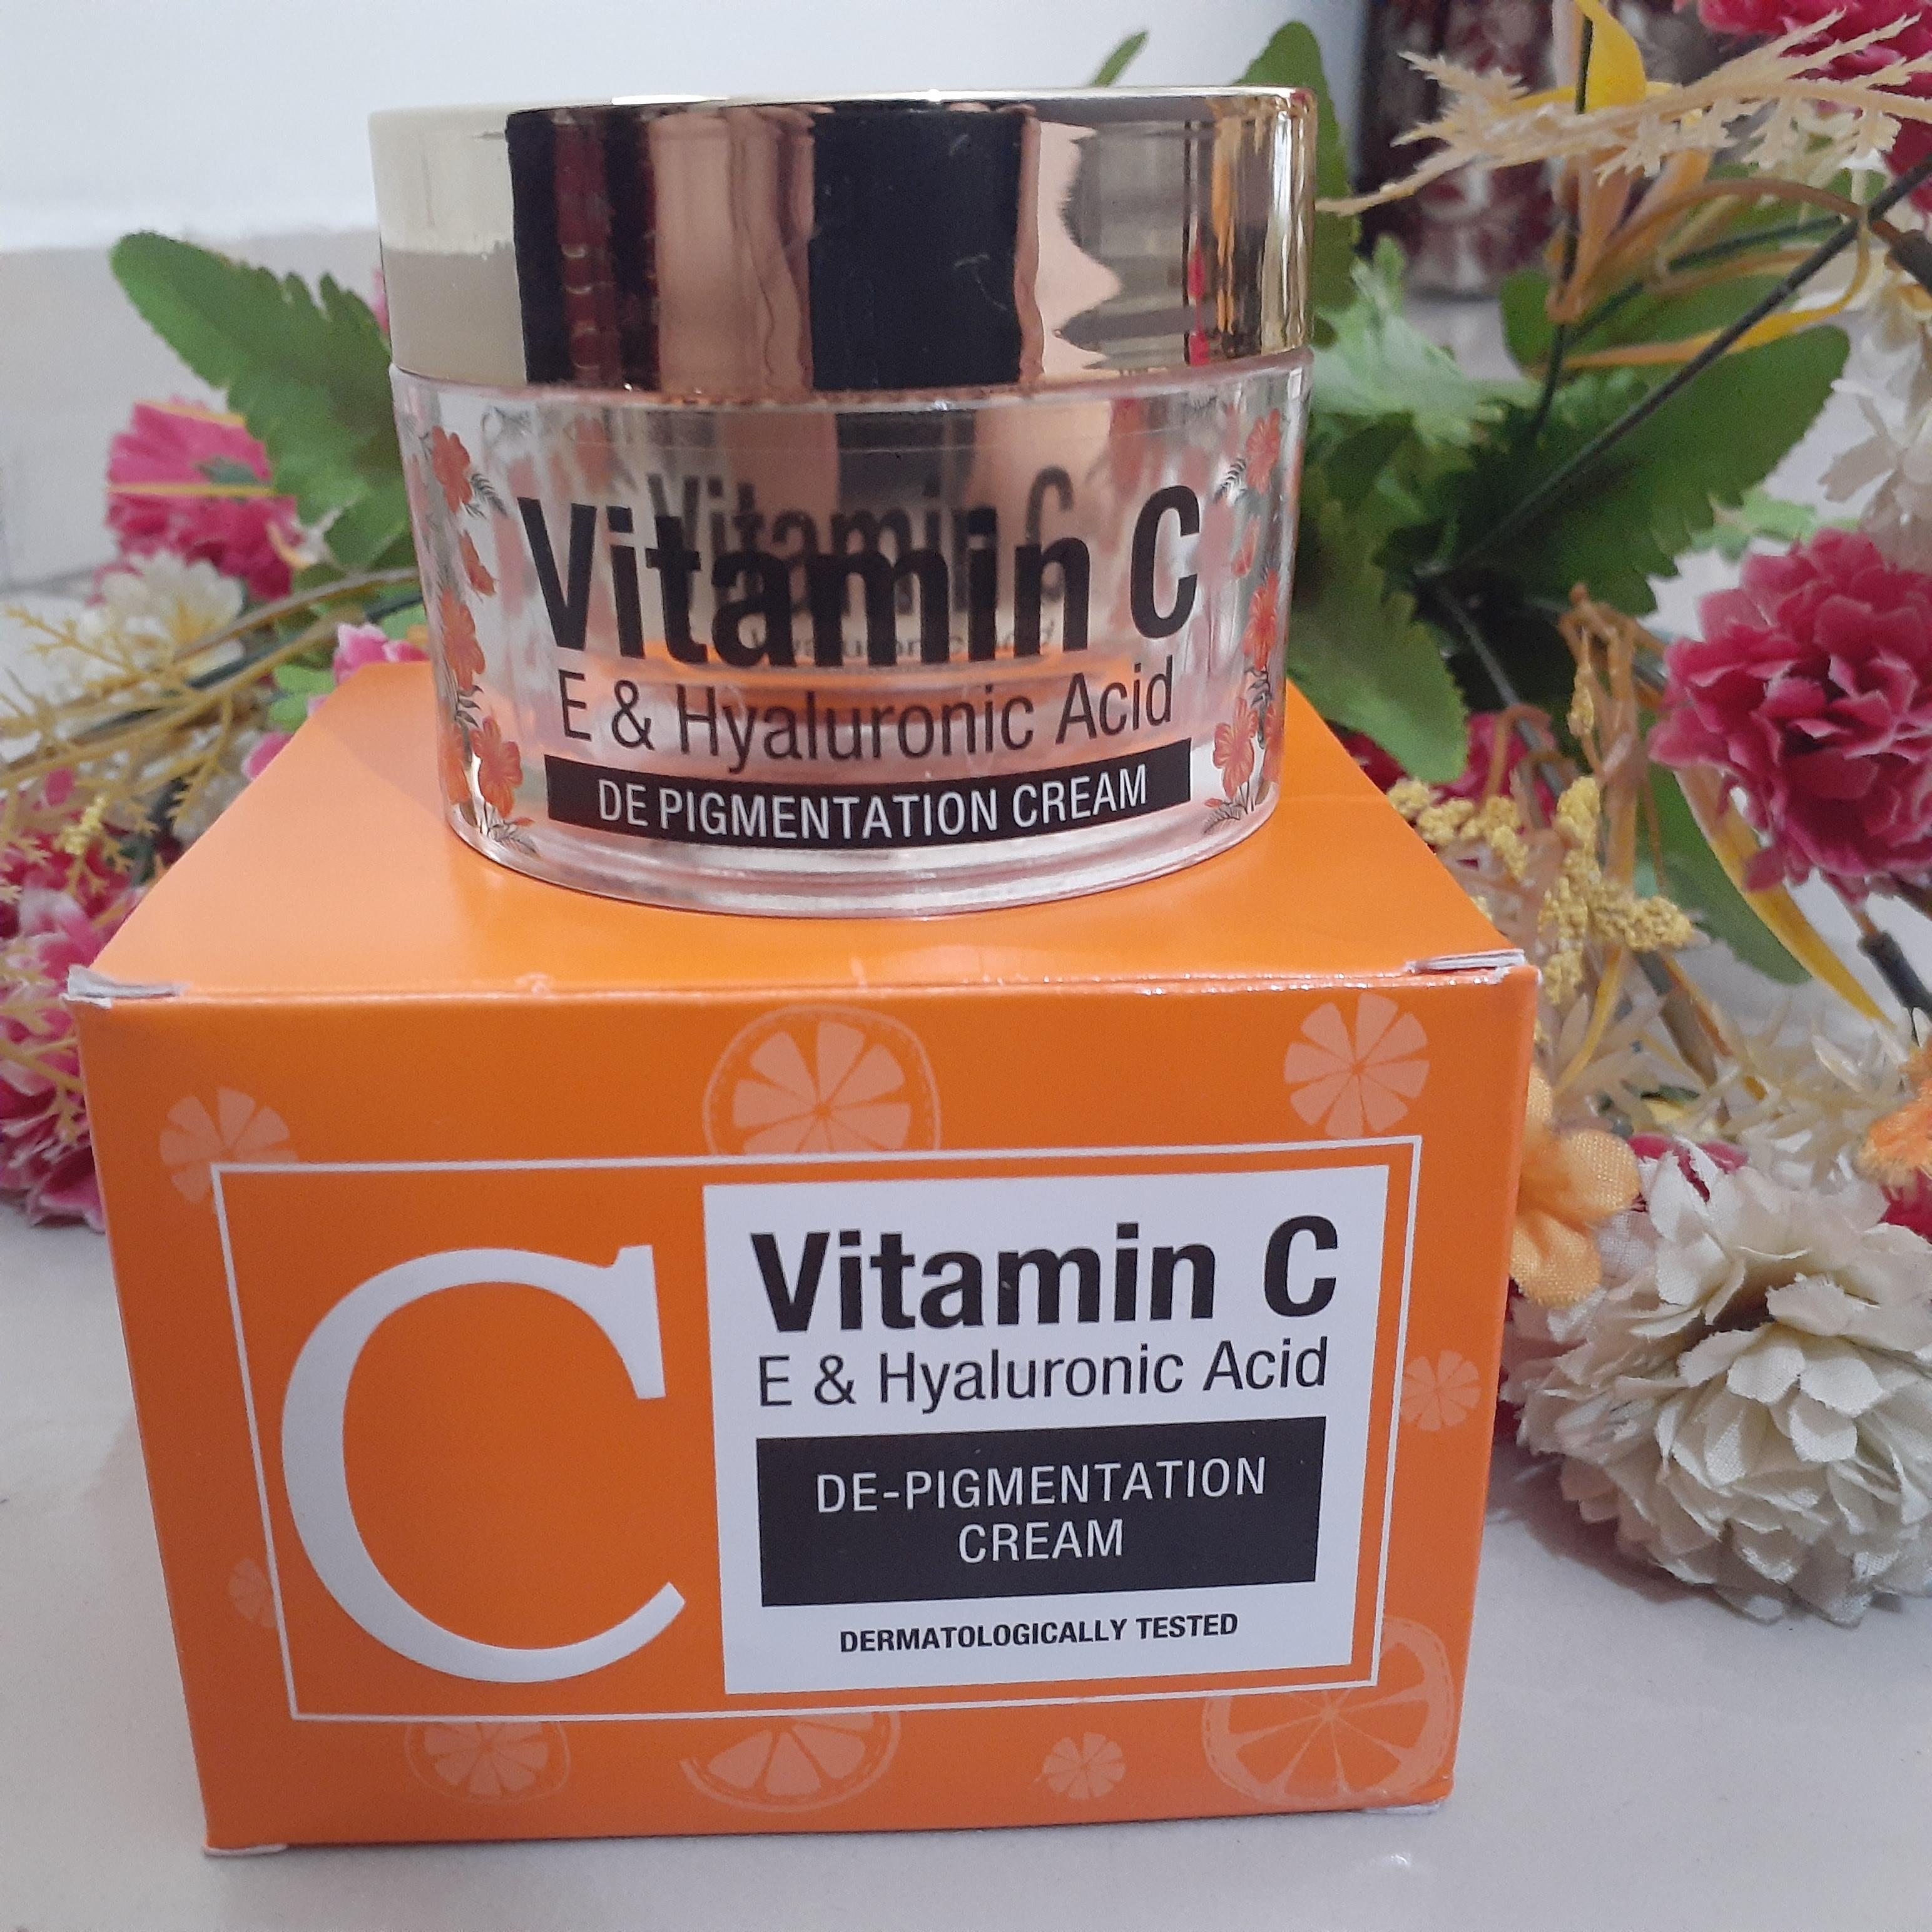 St.Botanica Vitamin C, E & Hyaluronic Acid DePigmentation Cream-Great texture-By sweety_tripathi